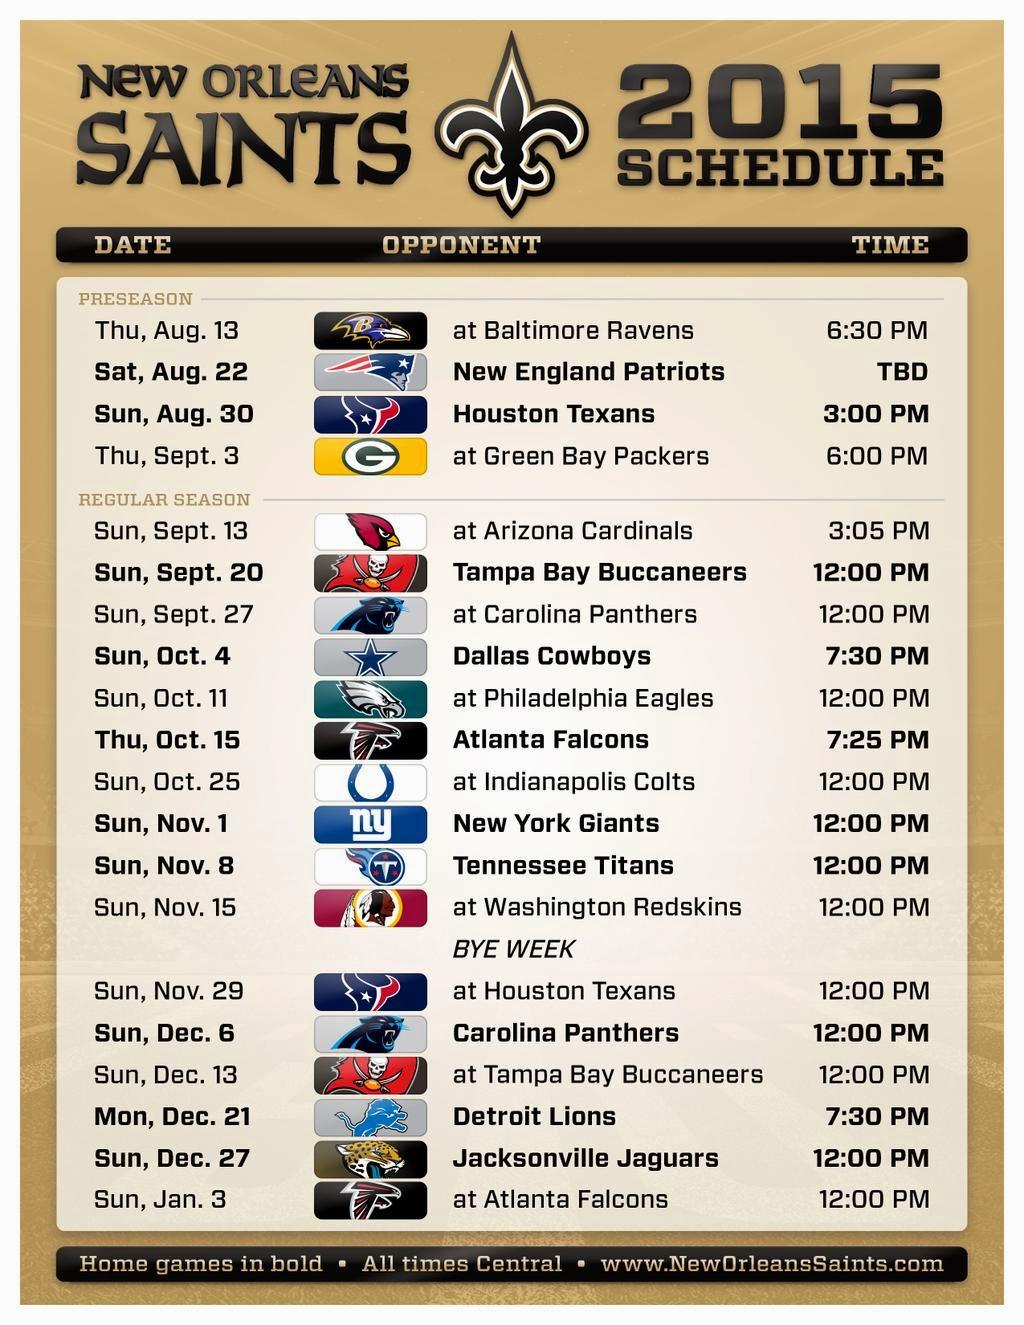 http://www.neworleanssaints.com/schedule/season-schedule.html